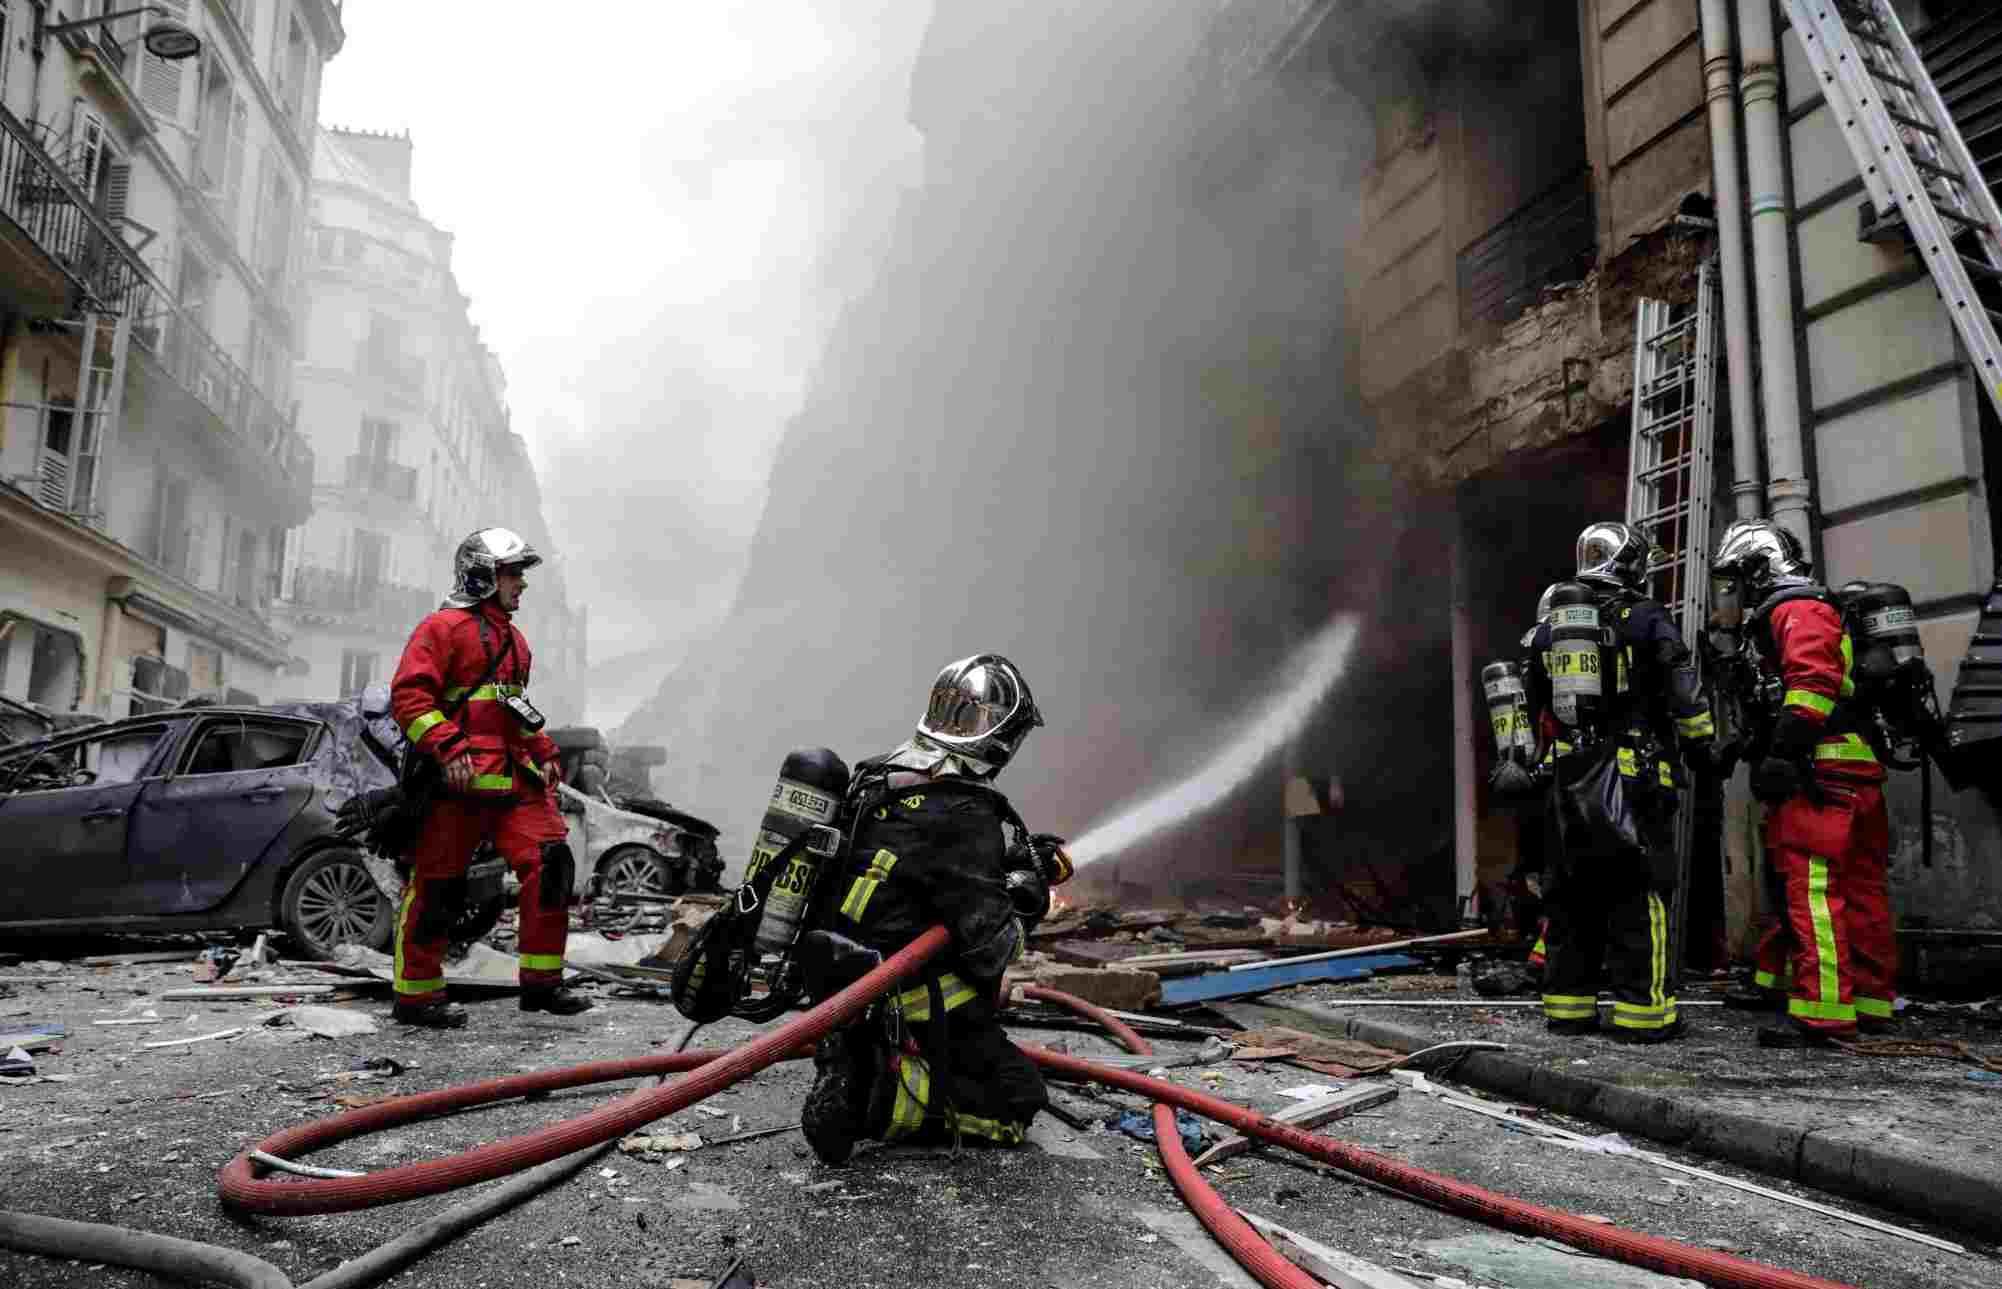 gas_eksplosion_i_paris.jpg